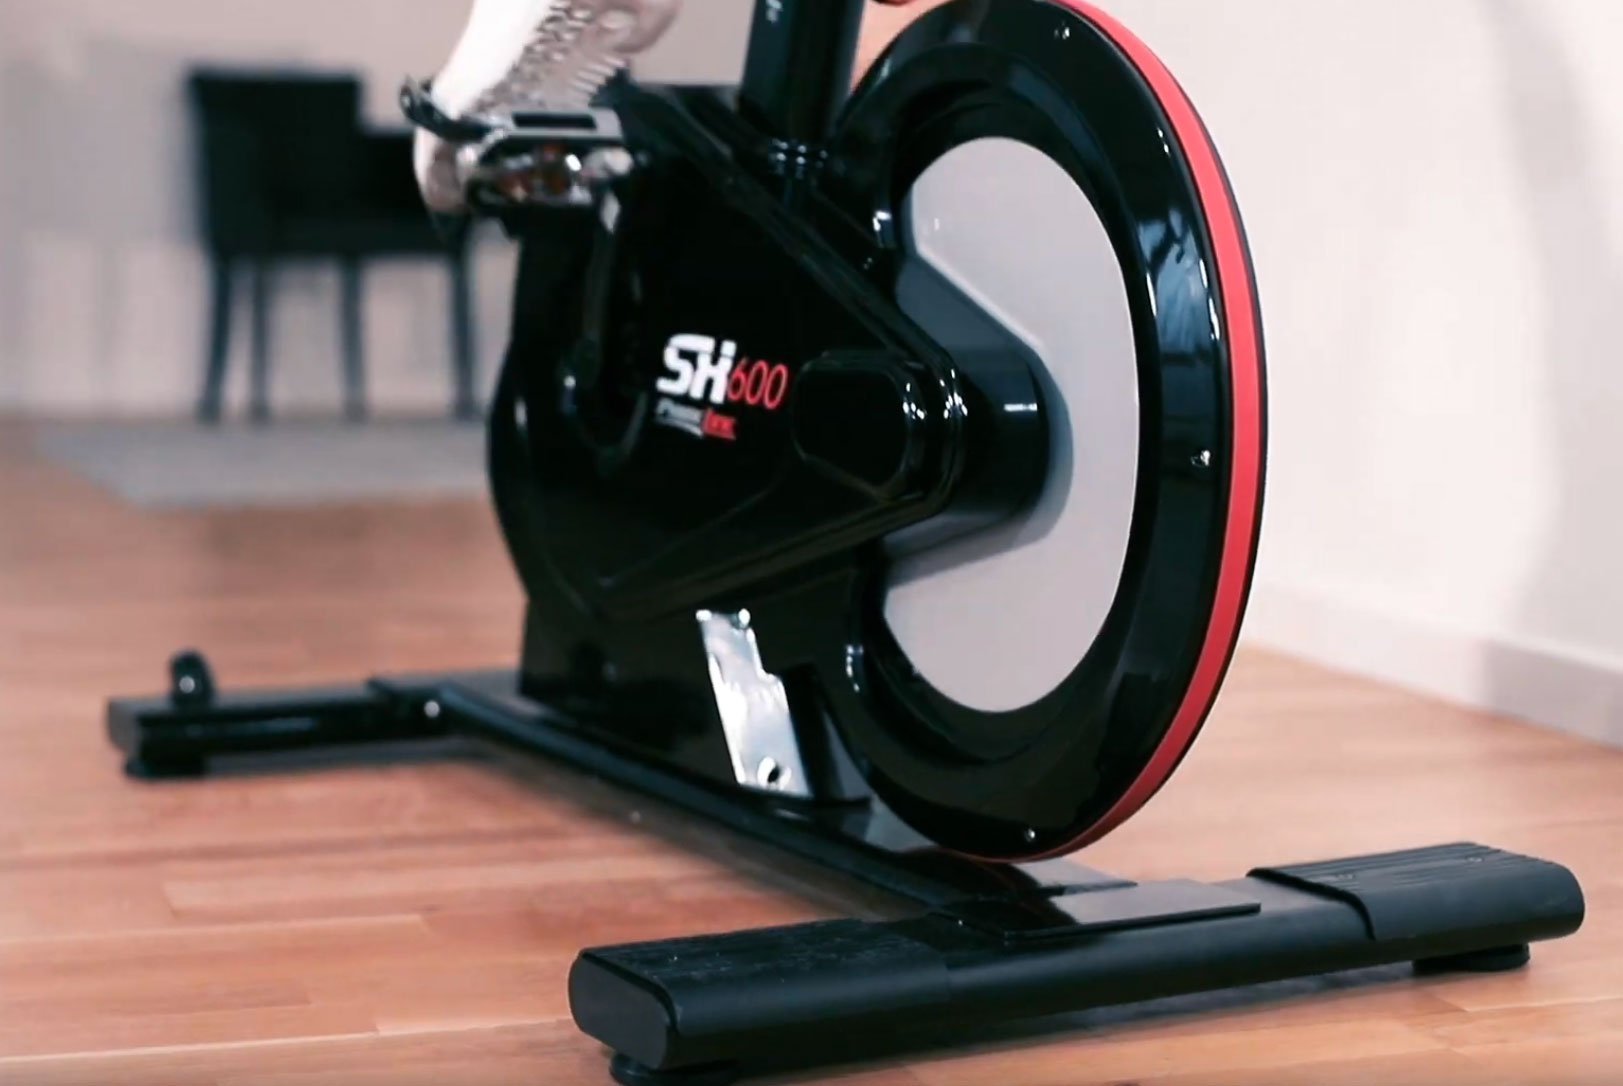 stabilite sportstech sx600